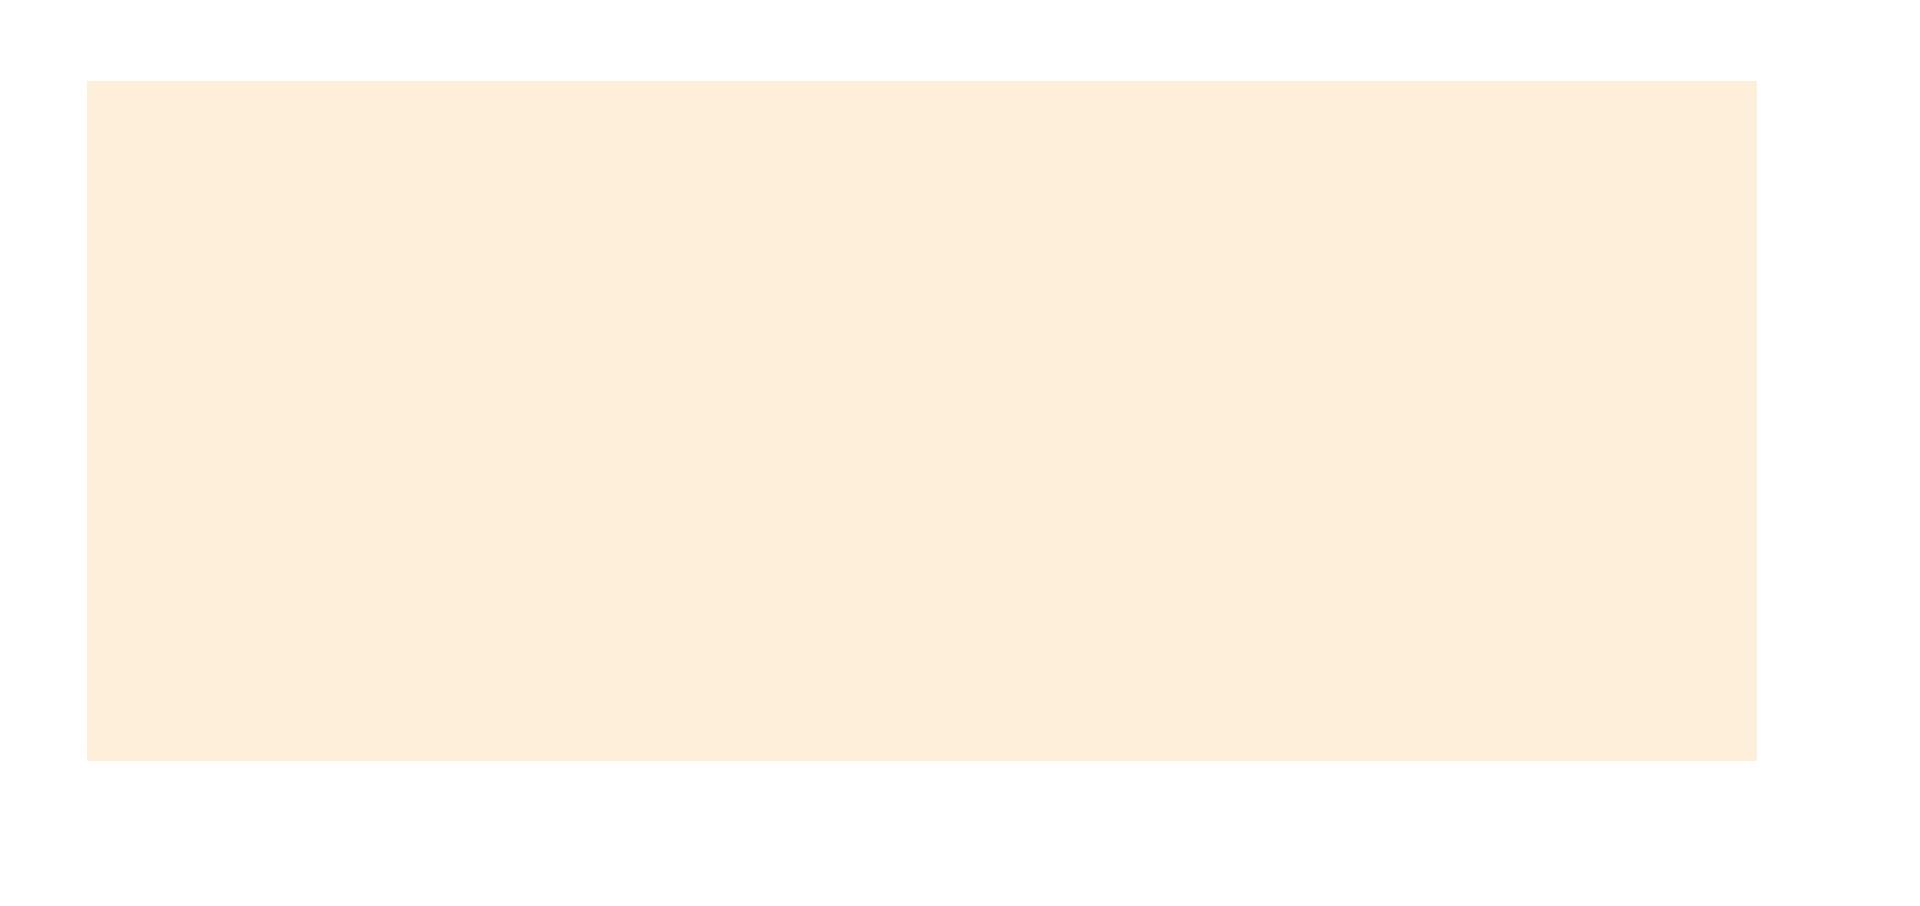 The Rutland Boughton Music Trust